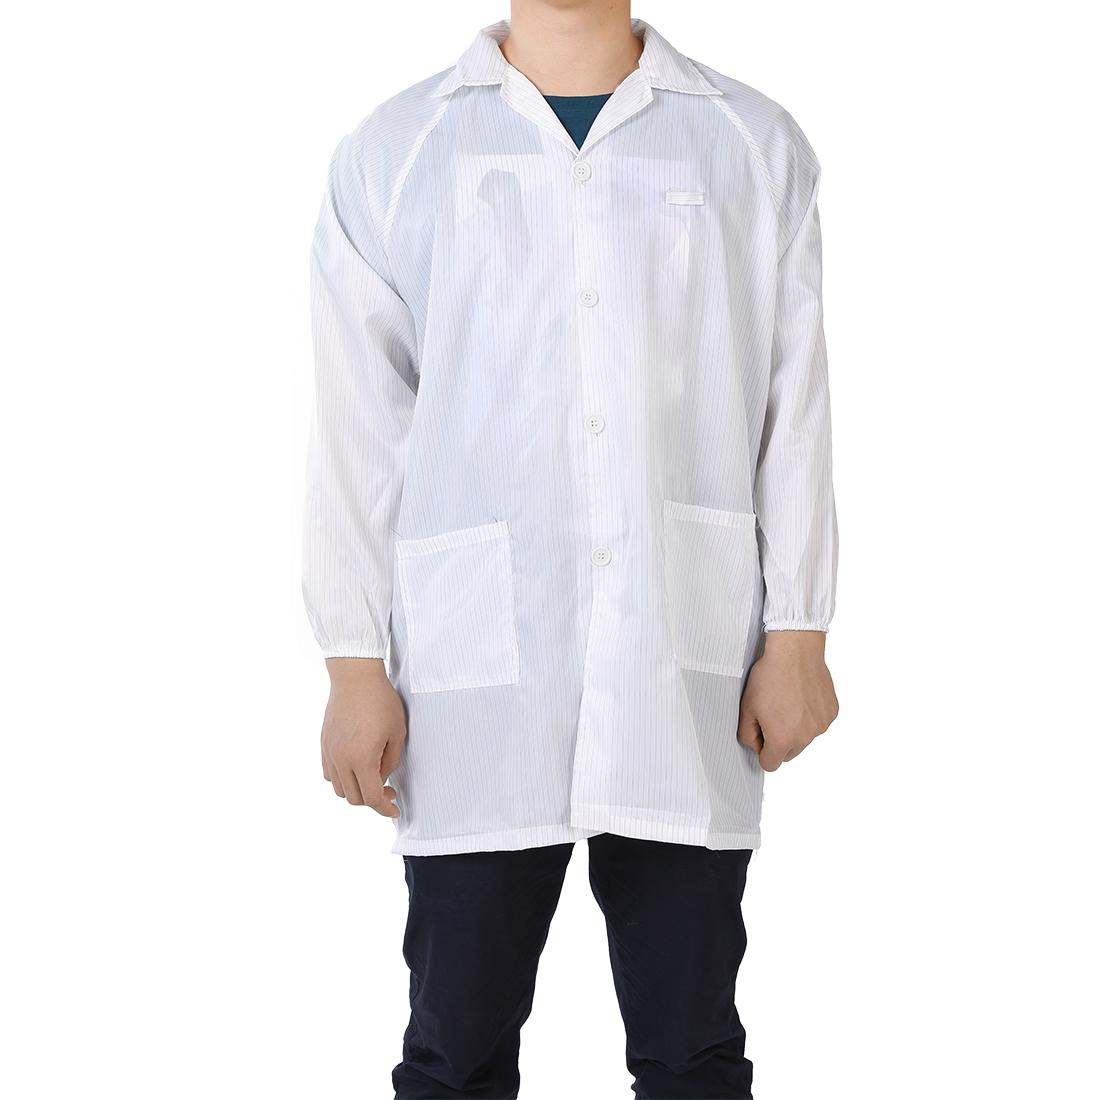 Anti Static Overalls Unisex ESD Lab Coat Button Up M White